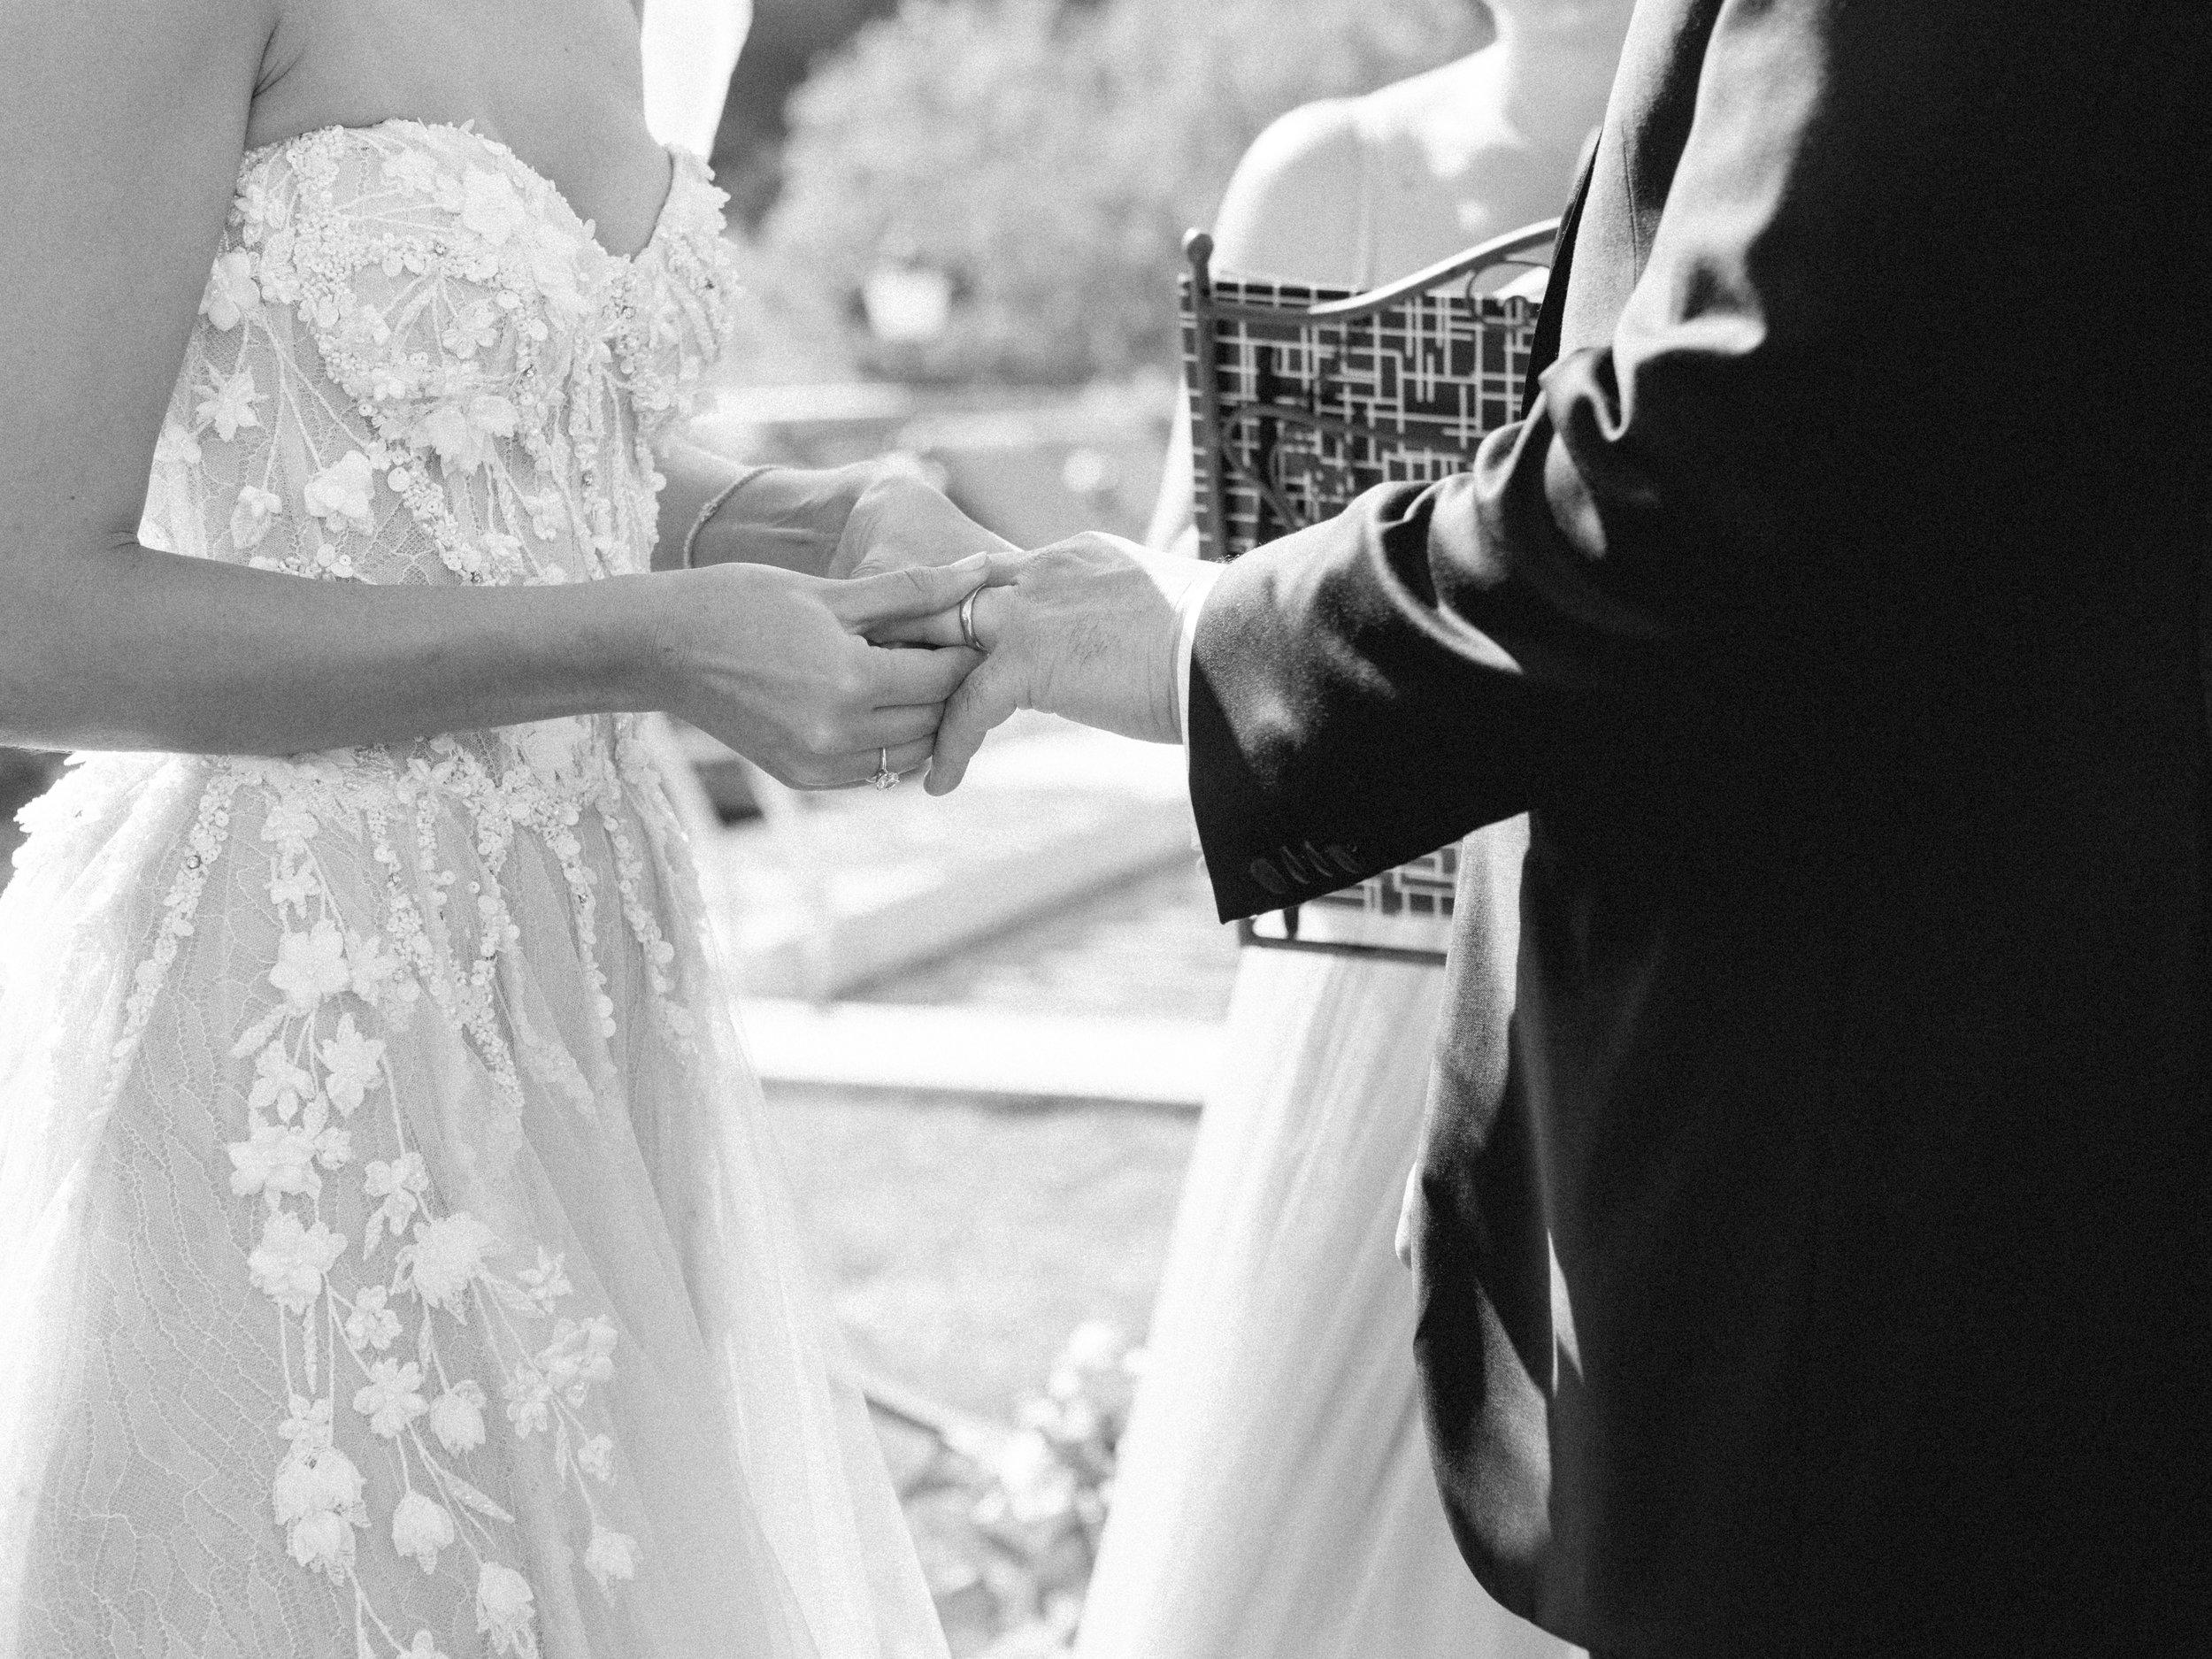 bastide_de_gordes_provence_wedding_(c)_rory-wylie-31.jpg